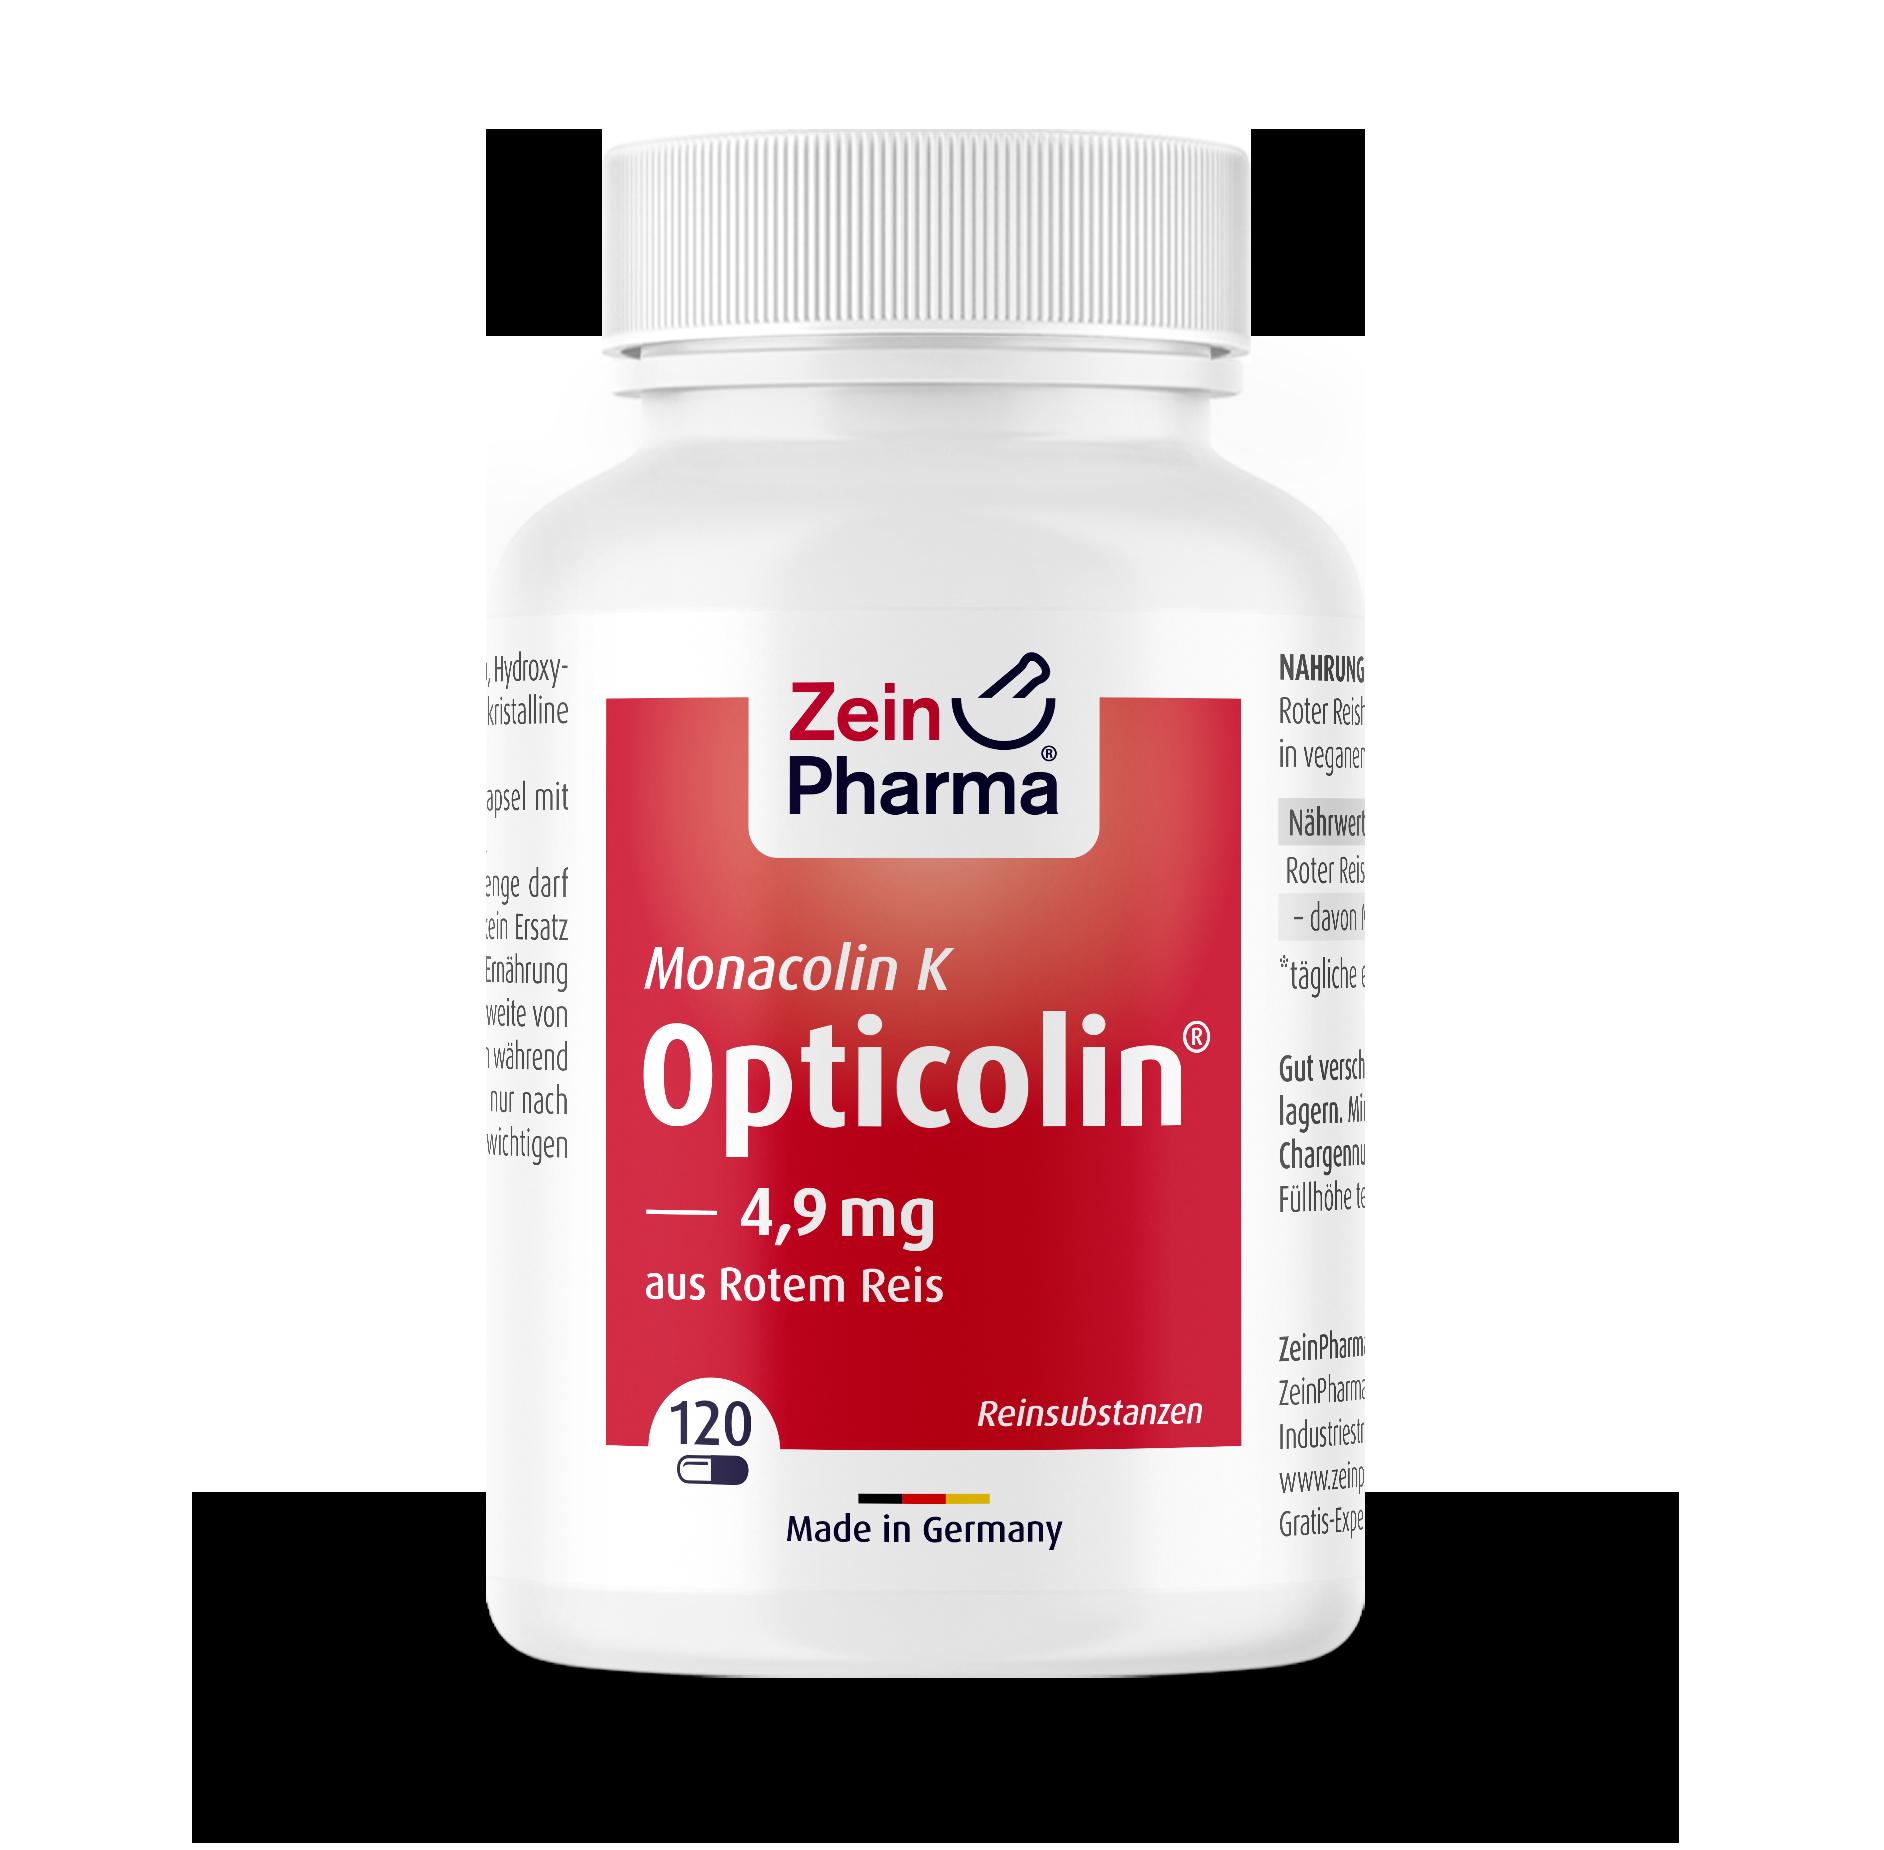 Monacolin K Opticolin® Kapseln